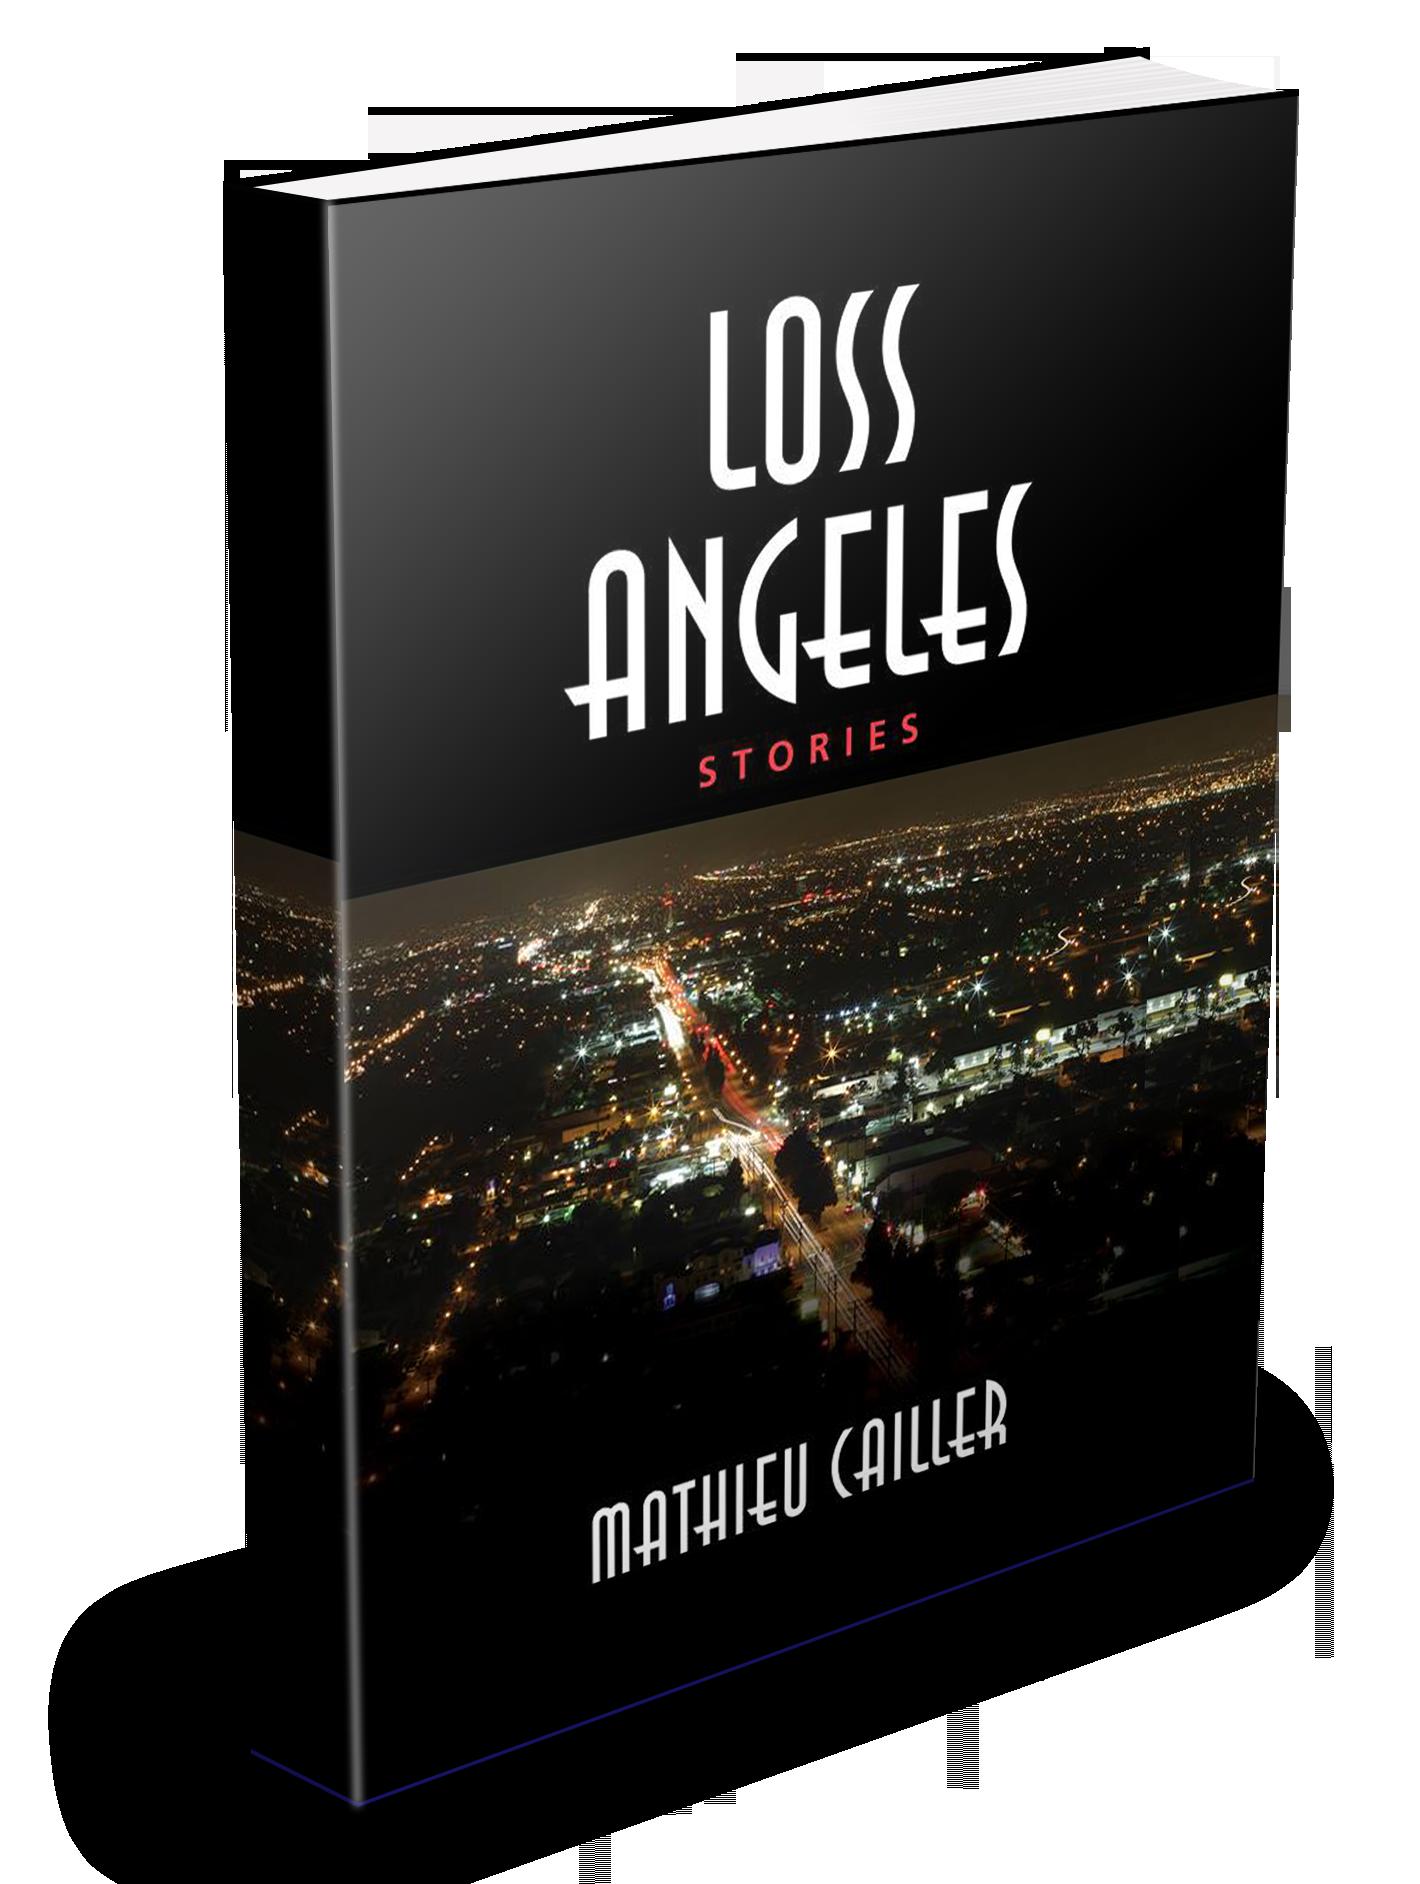 L.A. Times Book Festival